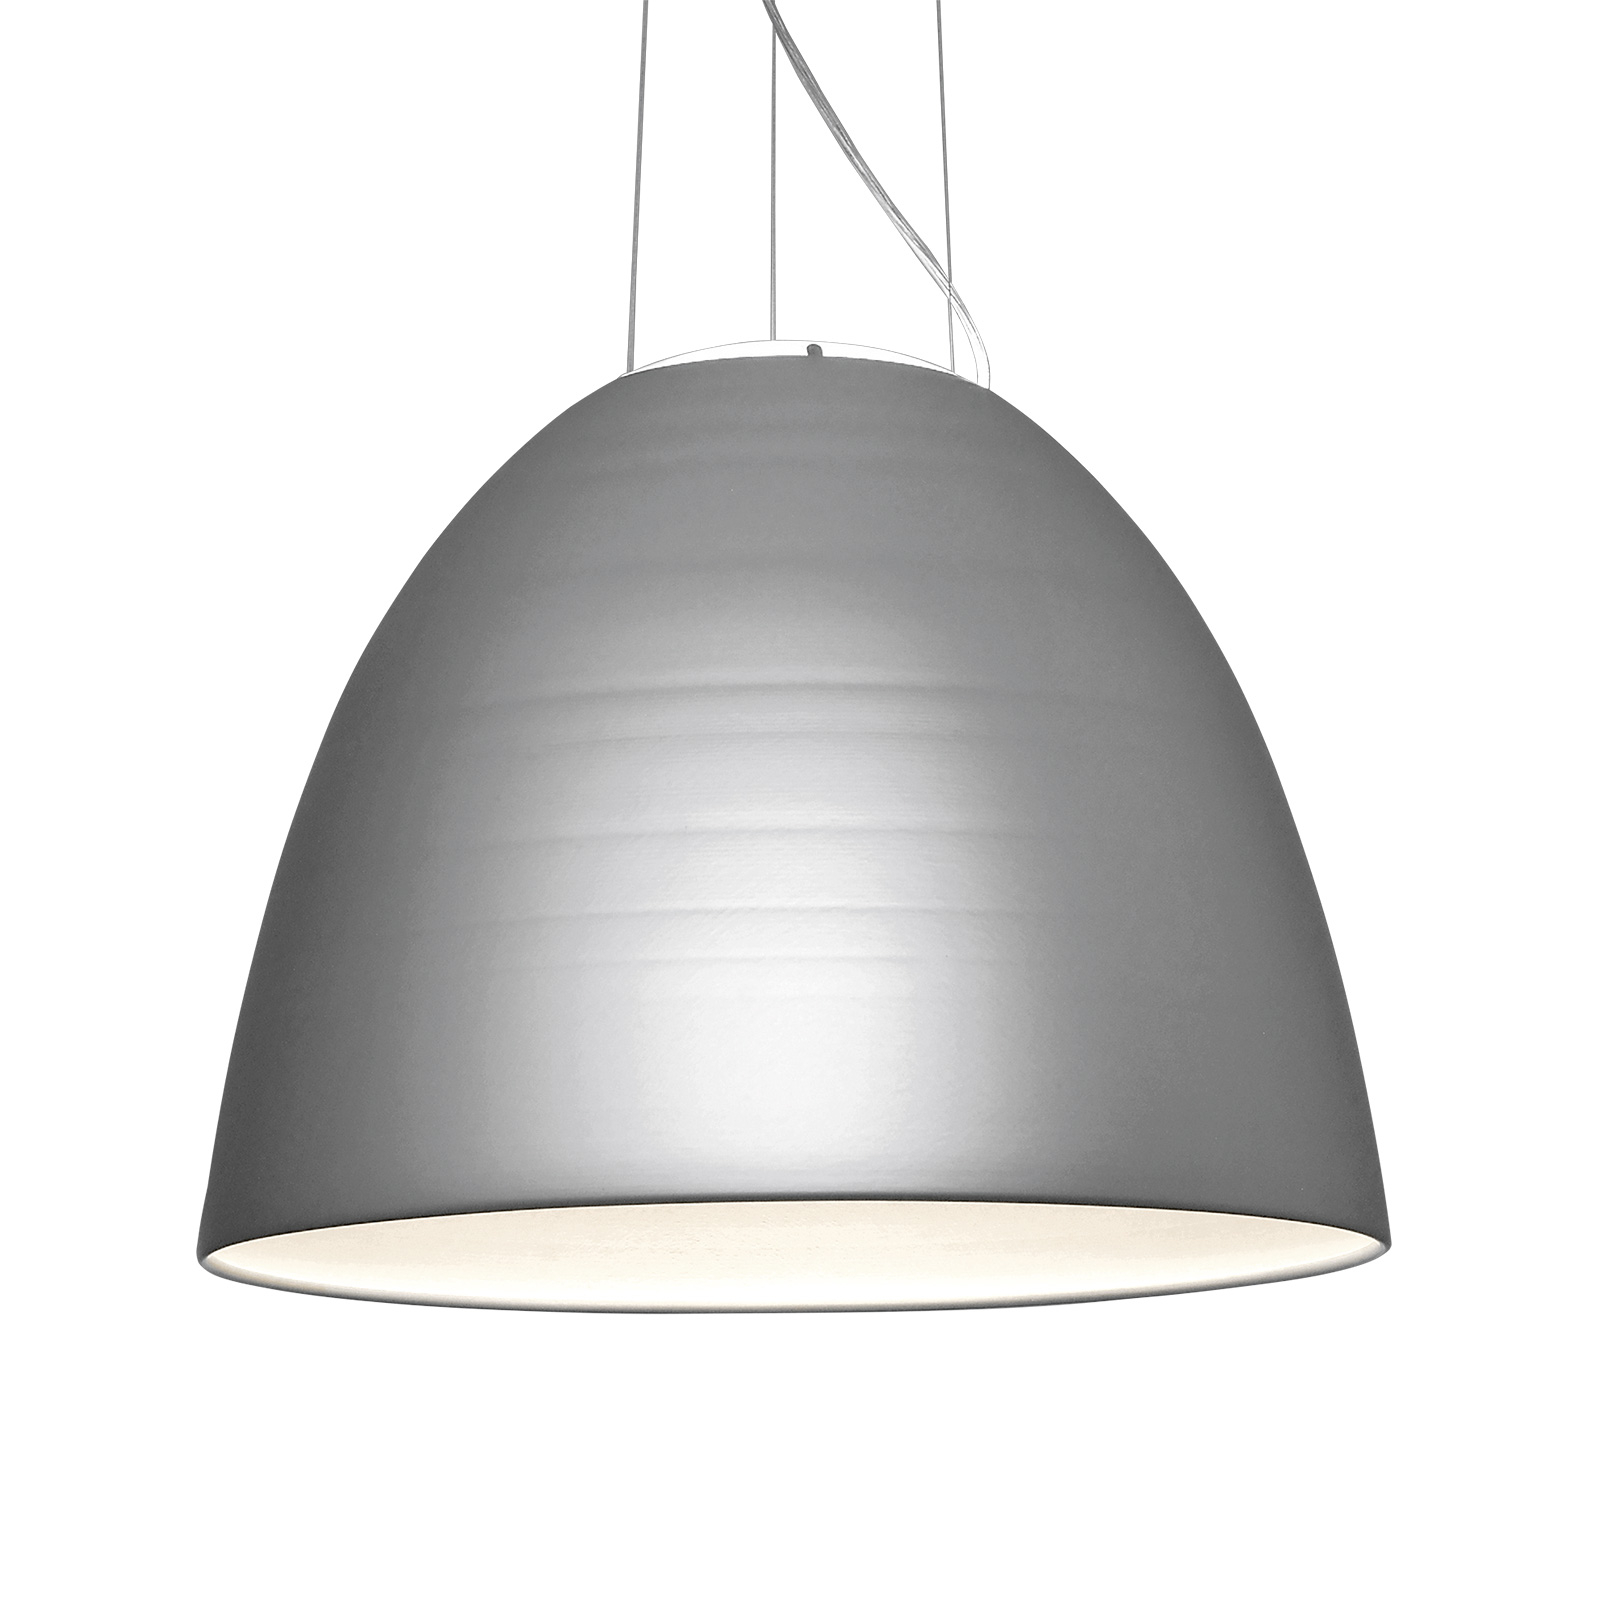 Artemide Nur 1618 LED-Hängeleuchte metallgrau